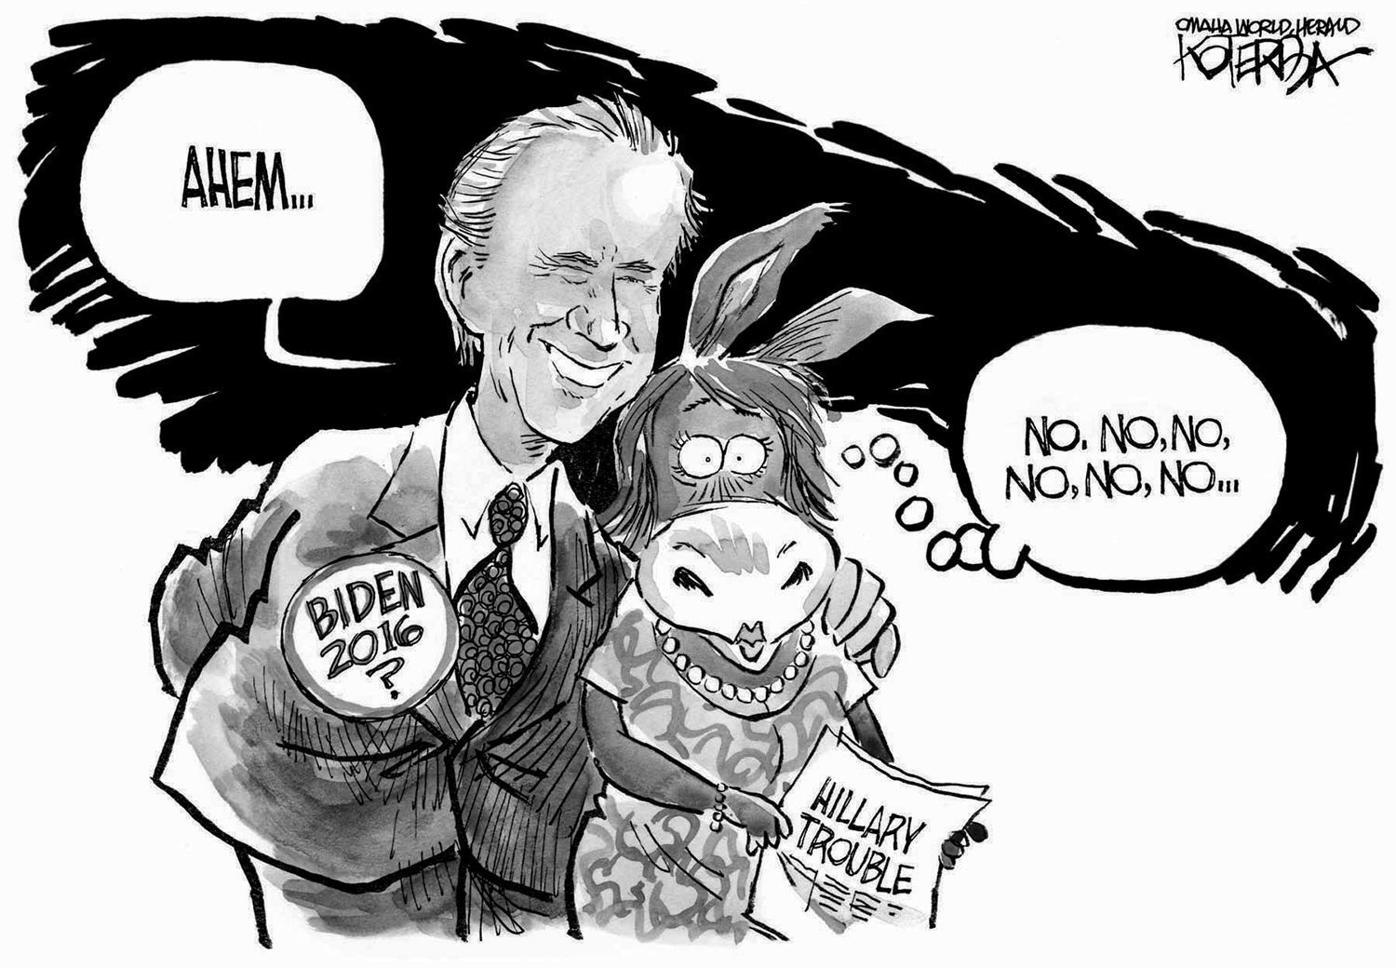 Biden Bad Touch for Democrats (2015)